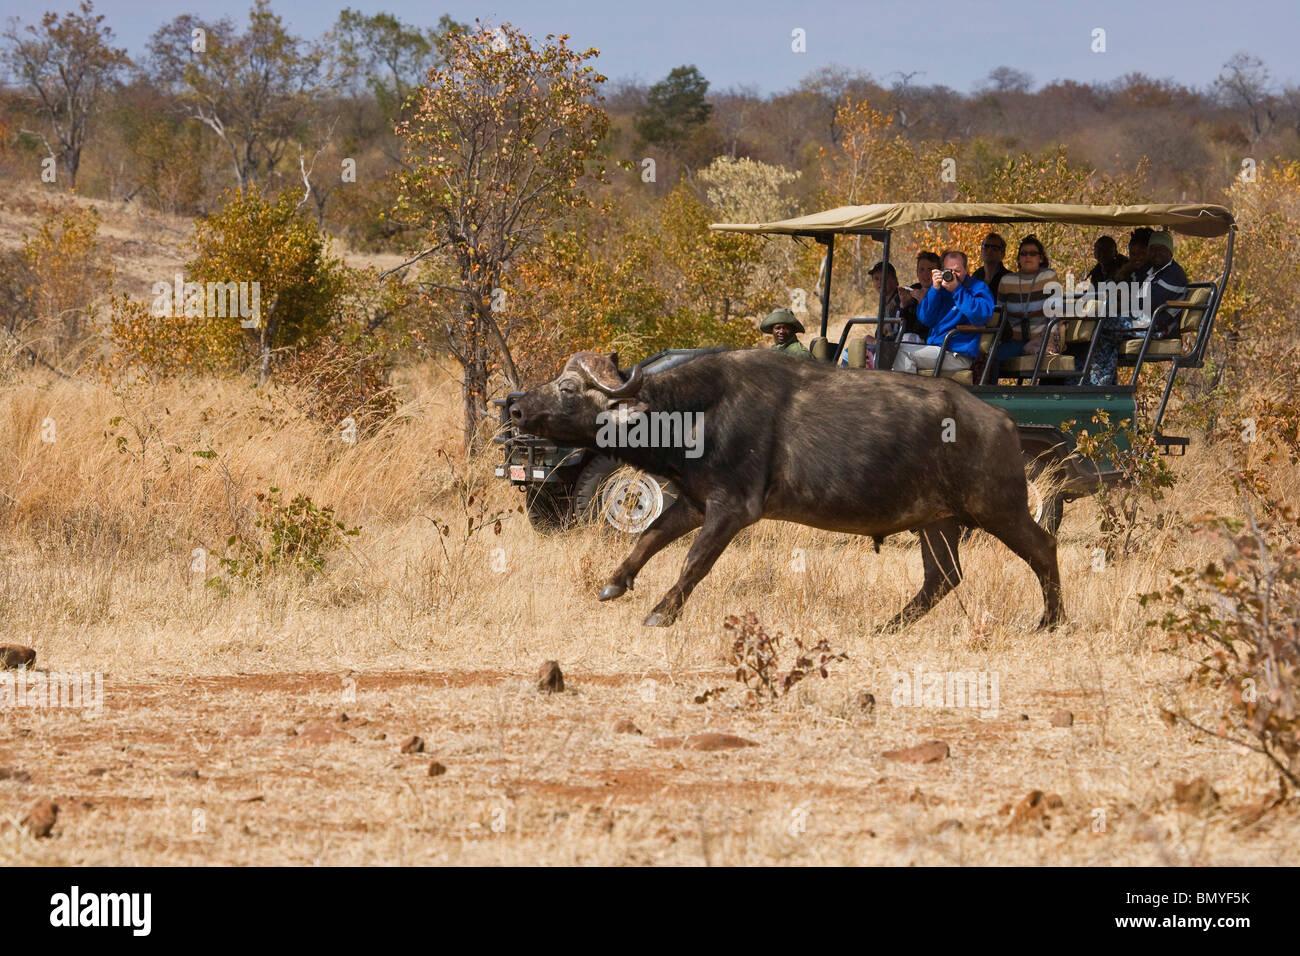 Tourists on a Game Drive watching a Cape Buffalo (Syncerus caffer). Victoria Falls. Zimbabwe. - Stock Image